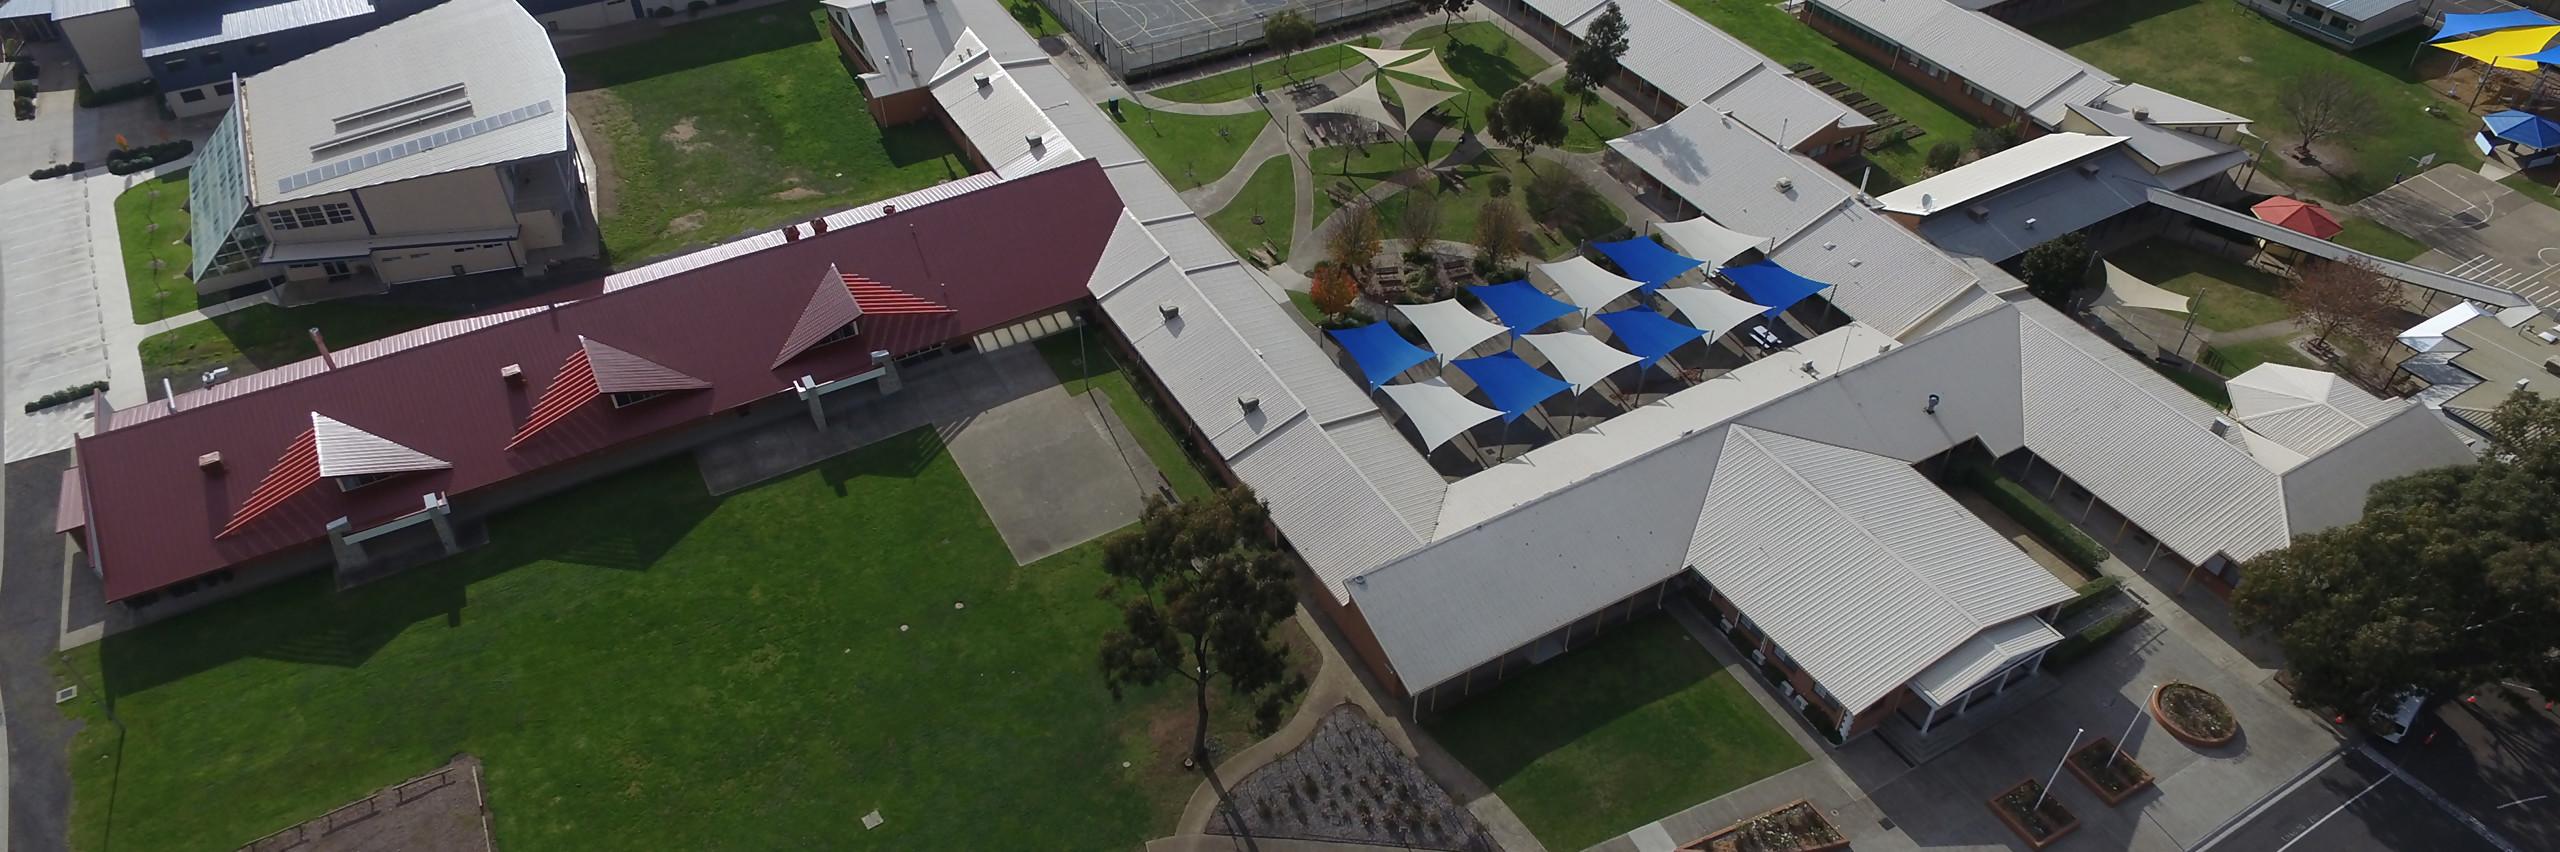 Gilson College